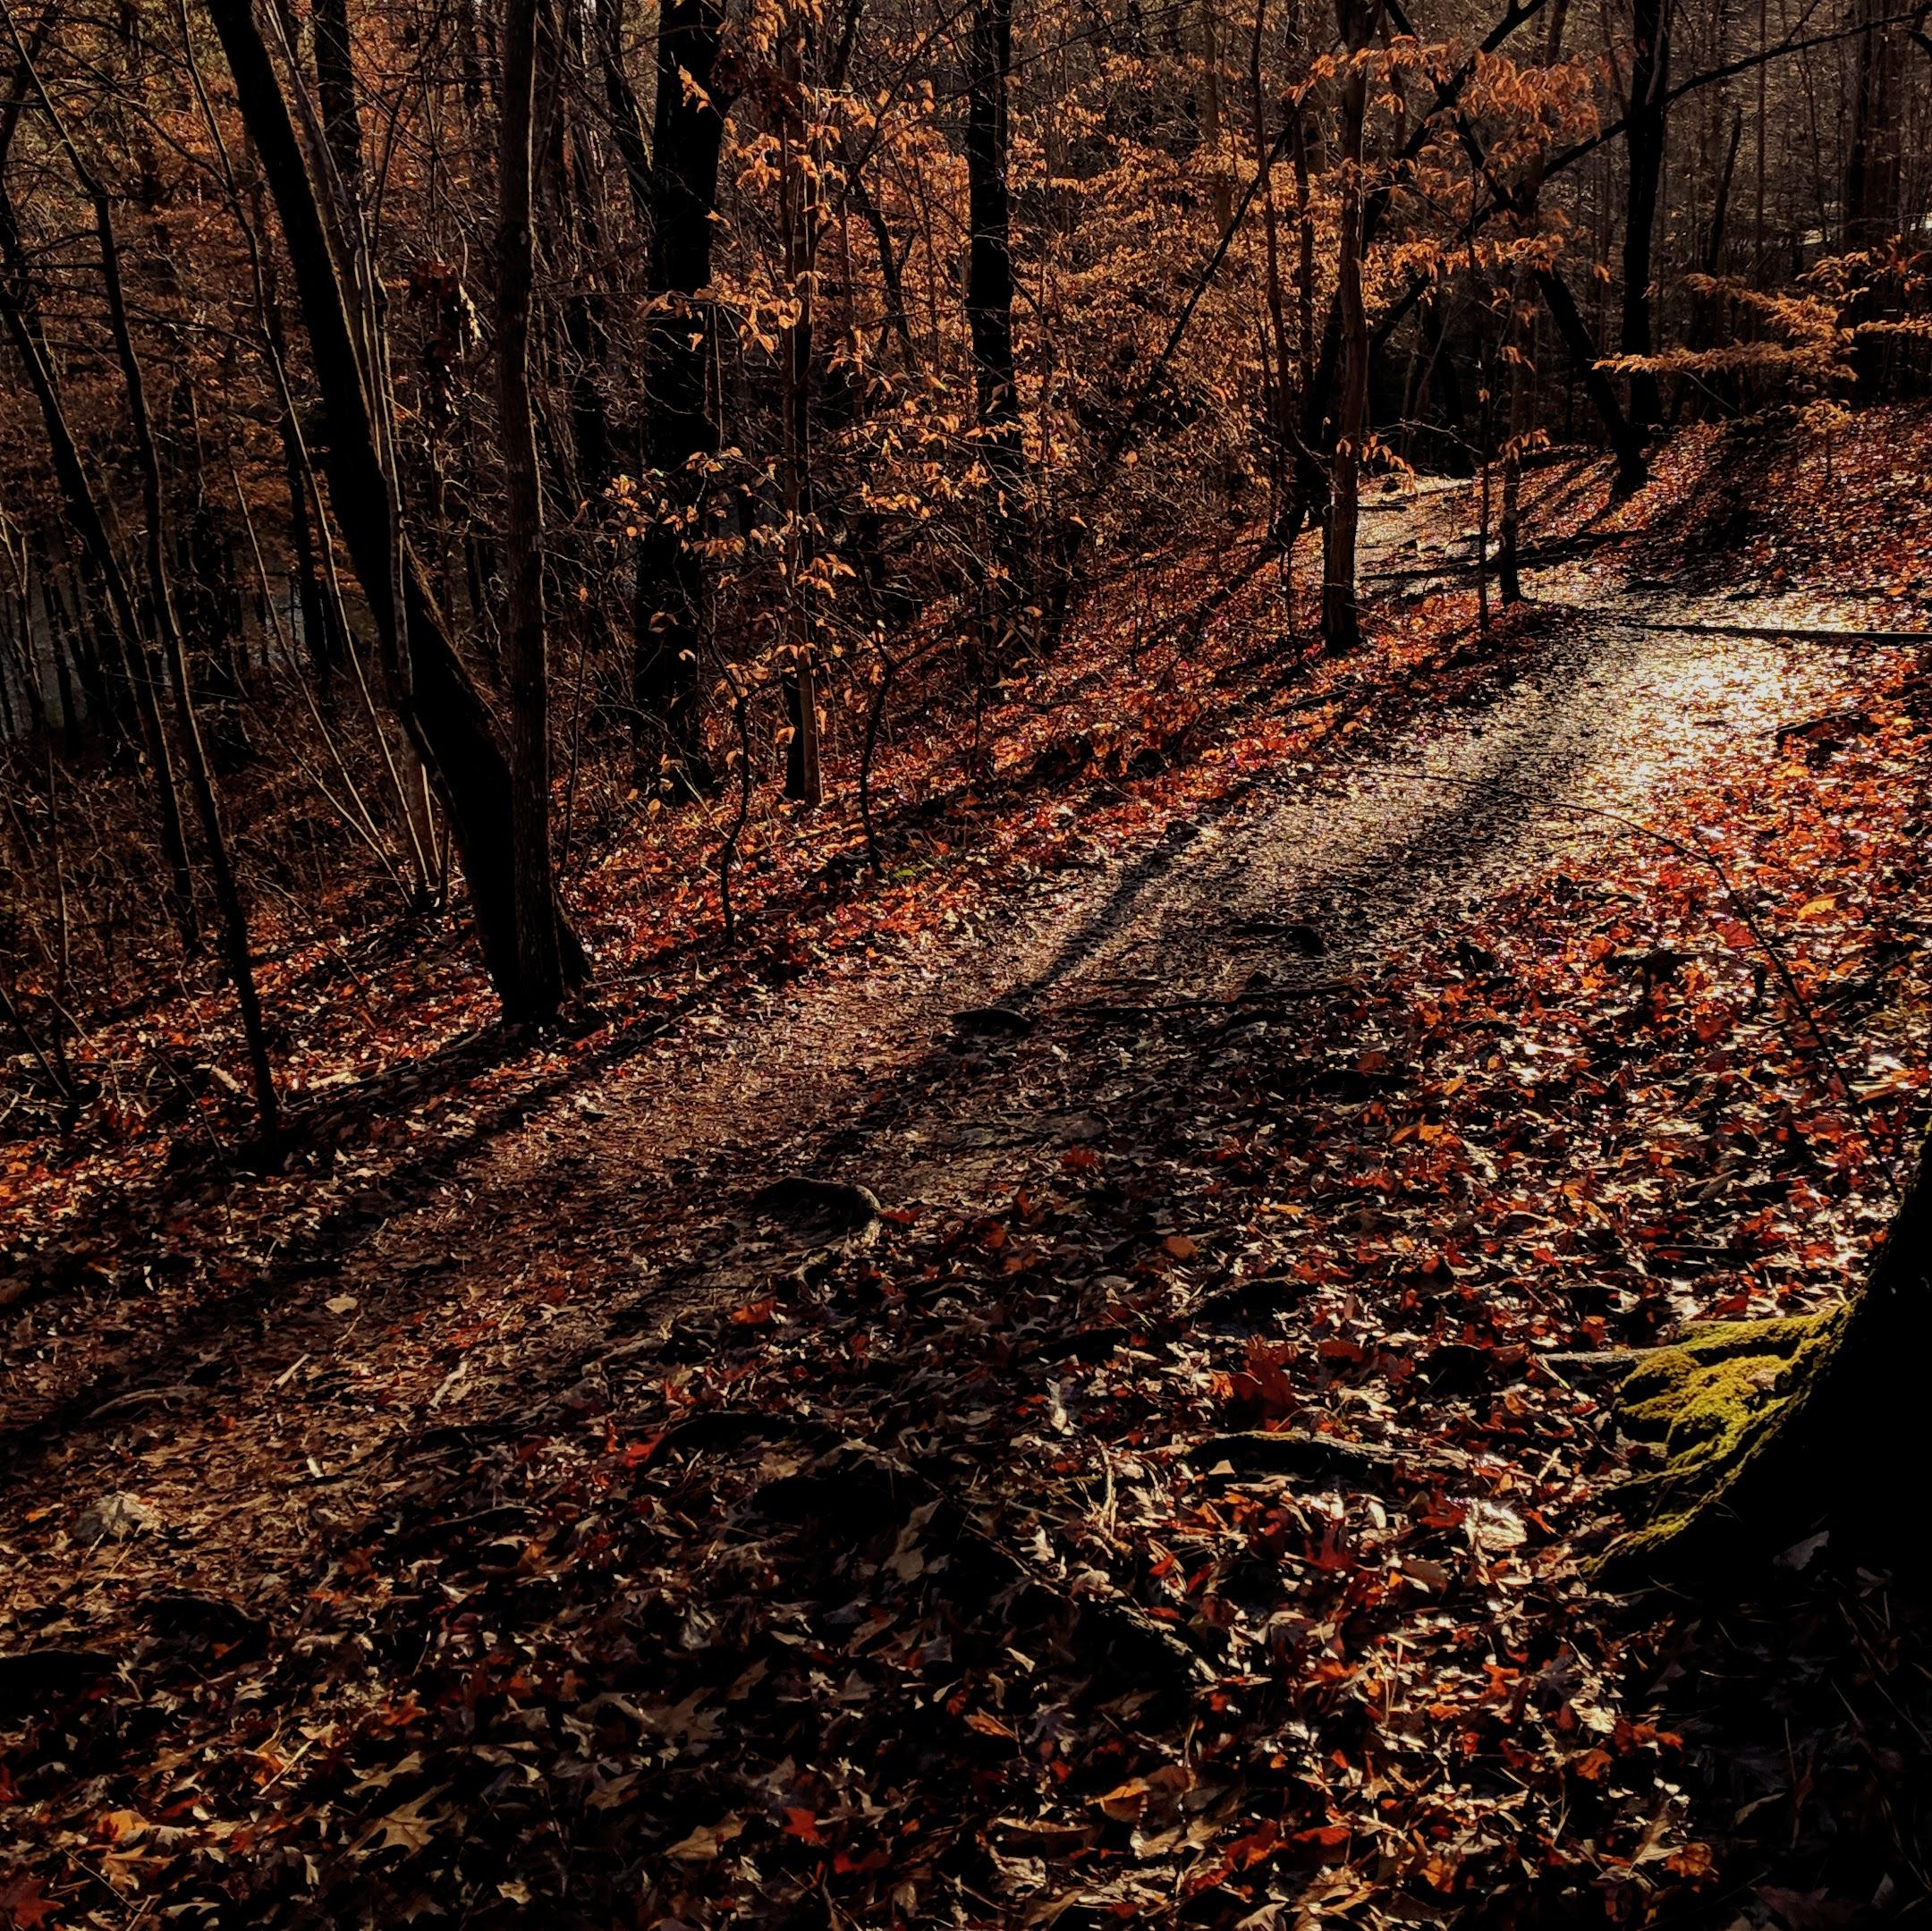 A sunlit path just makes me smile.